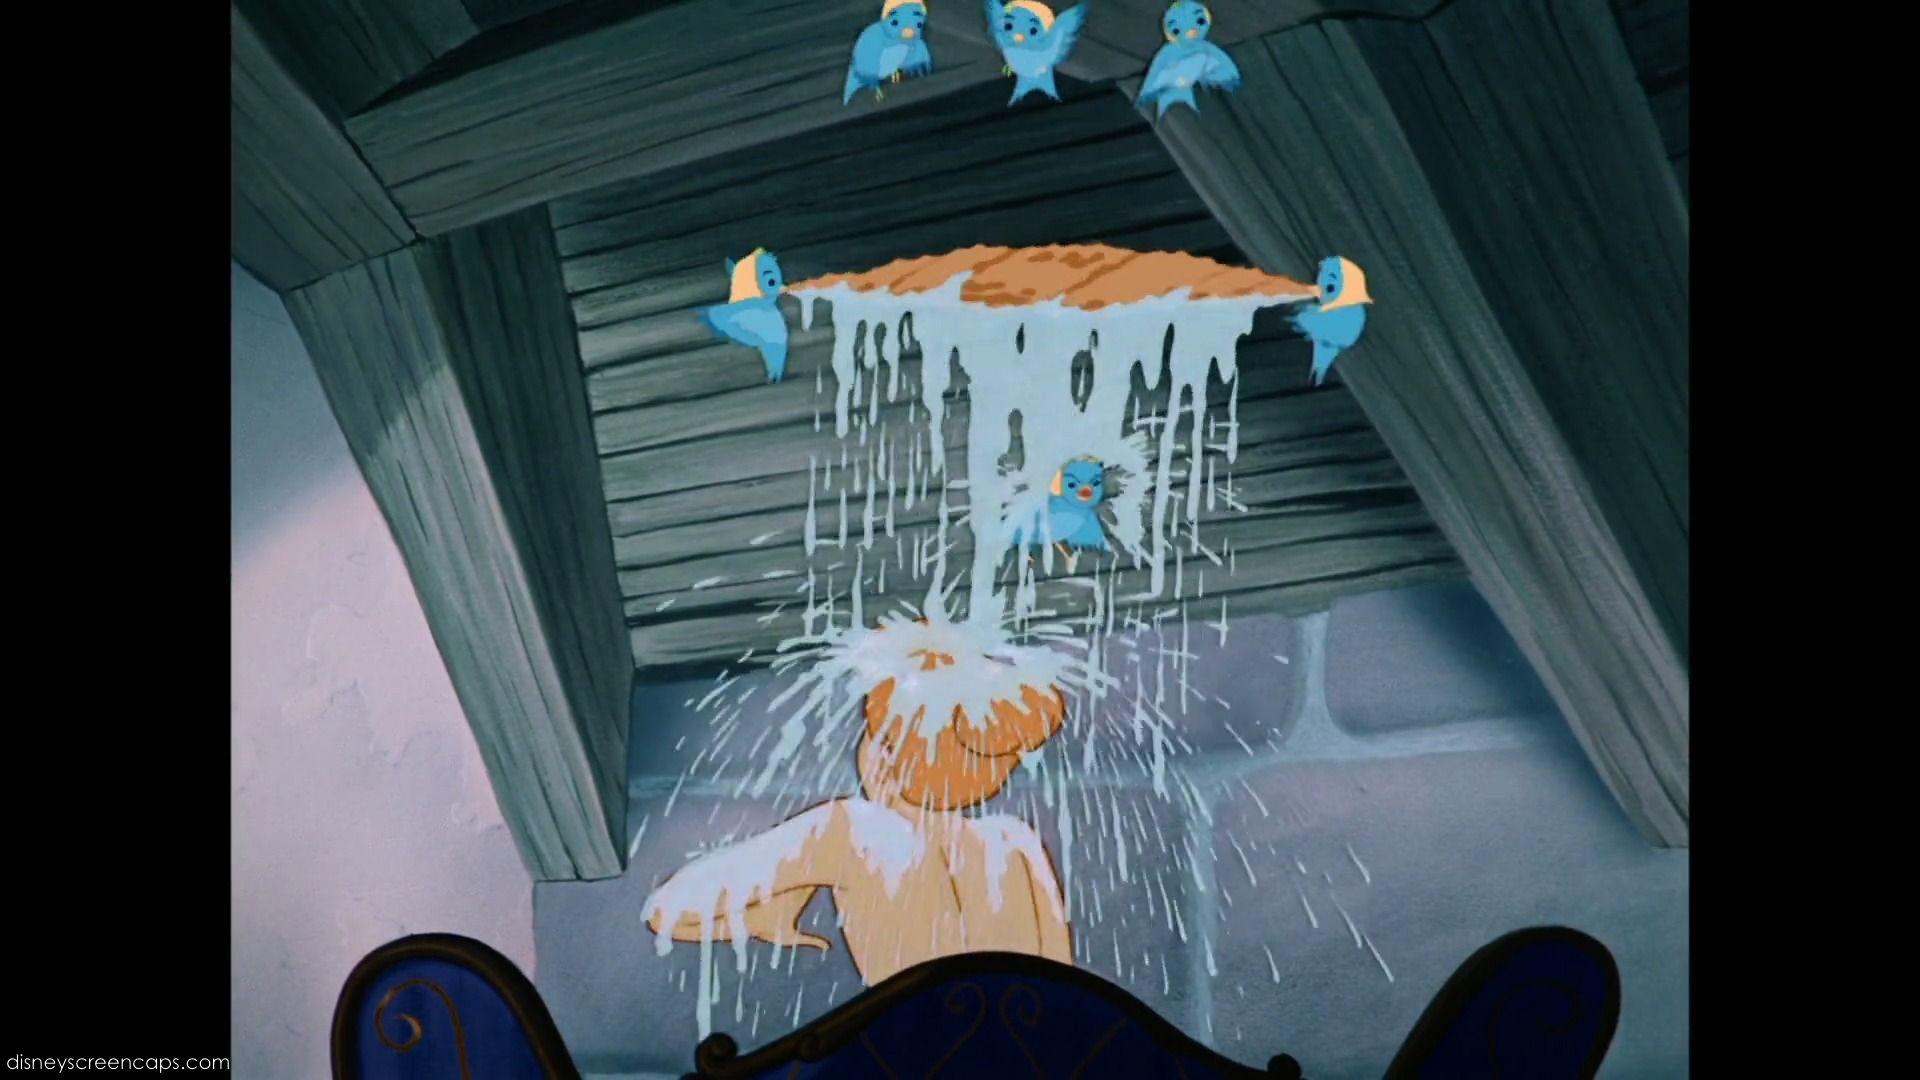 Showertime, Some of Cinderella Screencaps - cinderella Photo ...